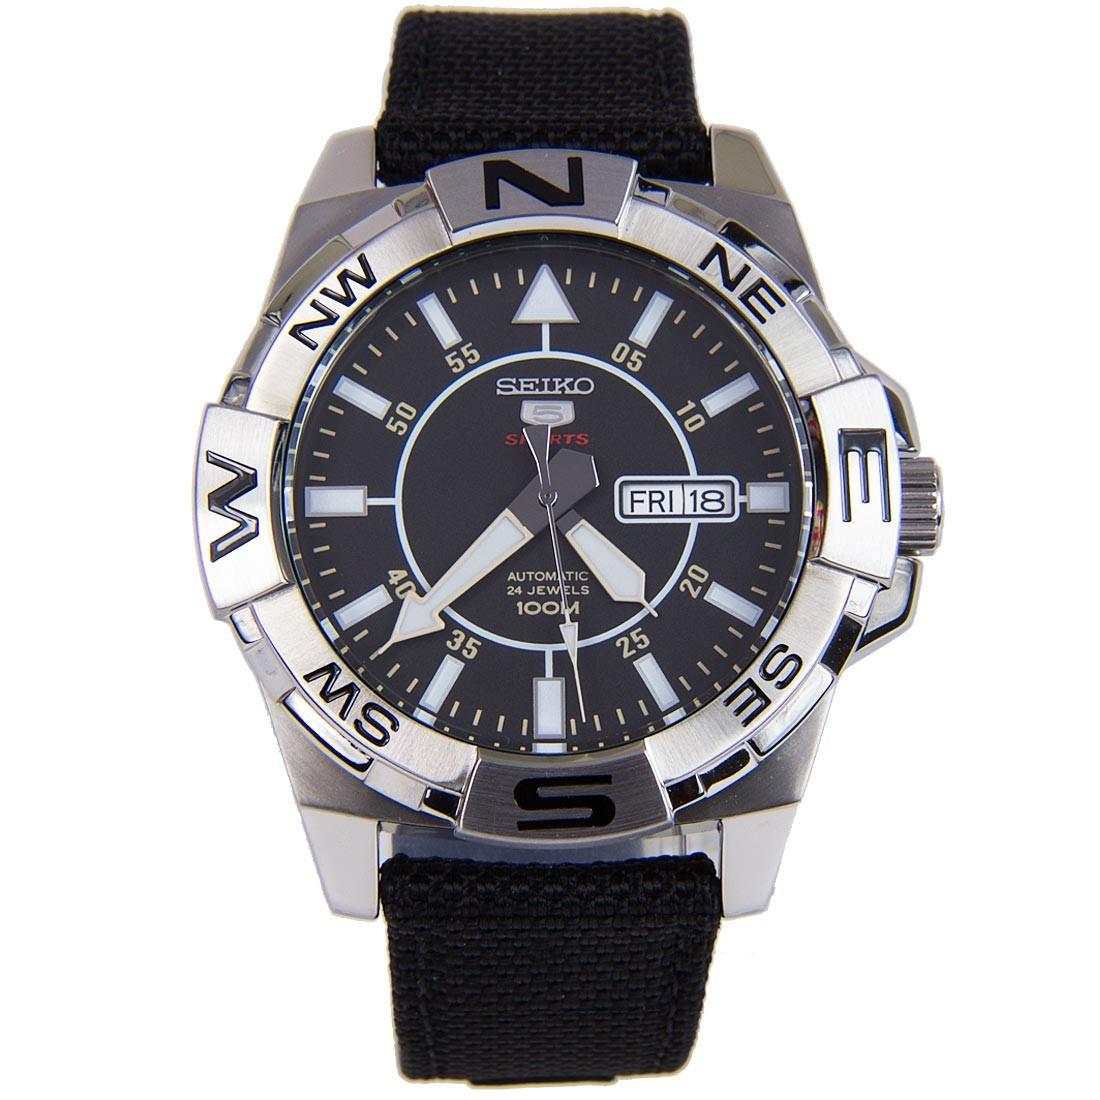 Часы Seiko 5 Sports SRPA69K1 Automatic 4R36